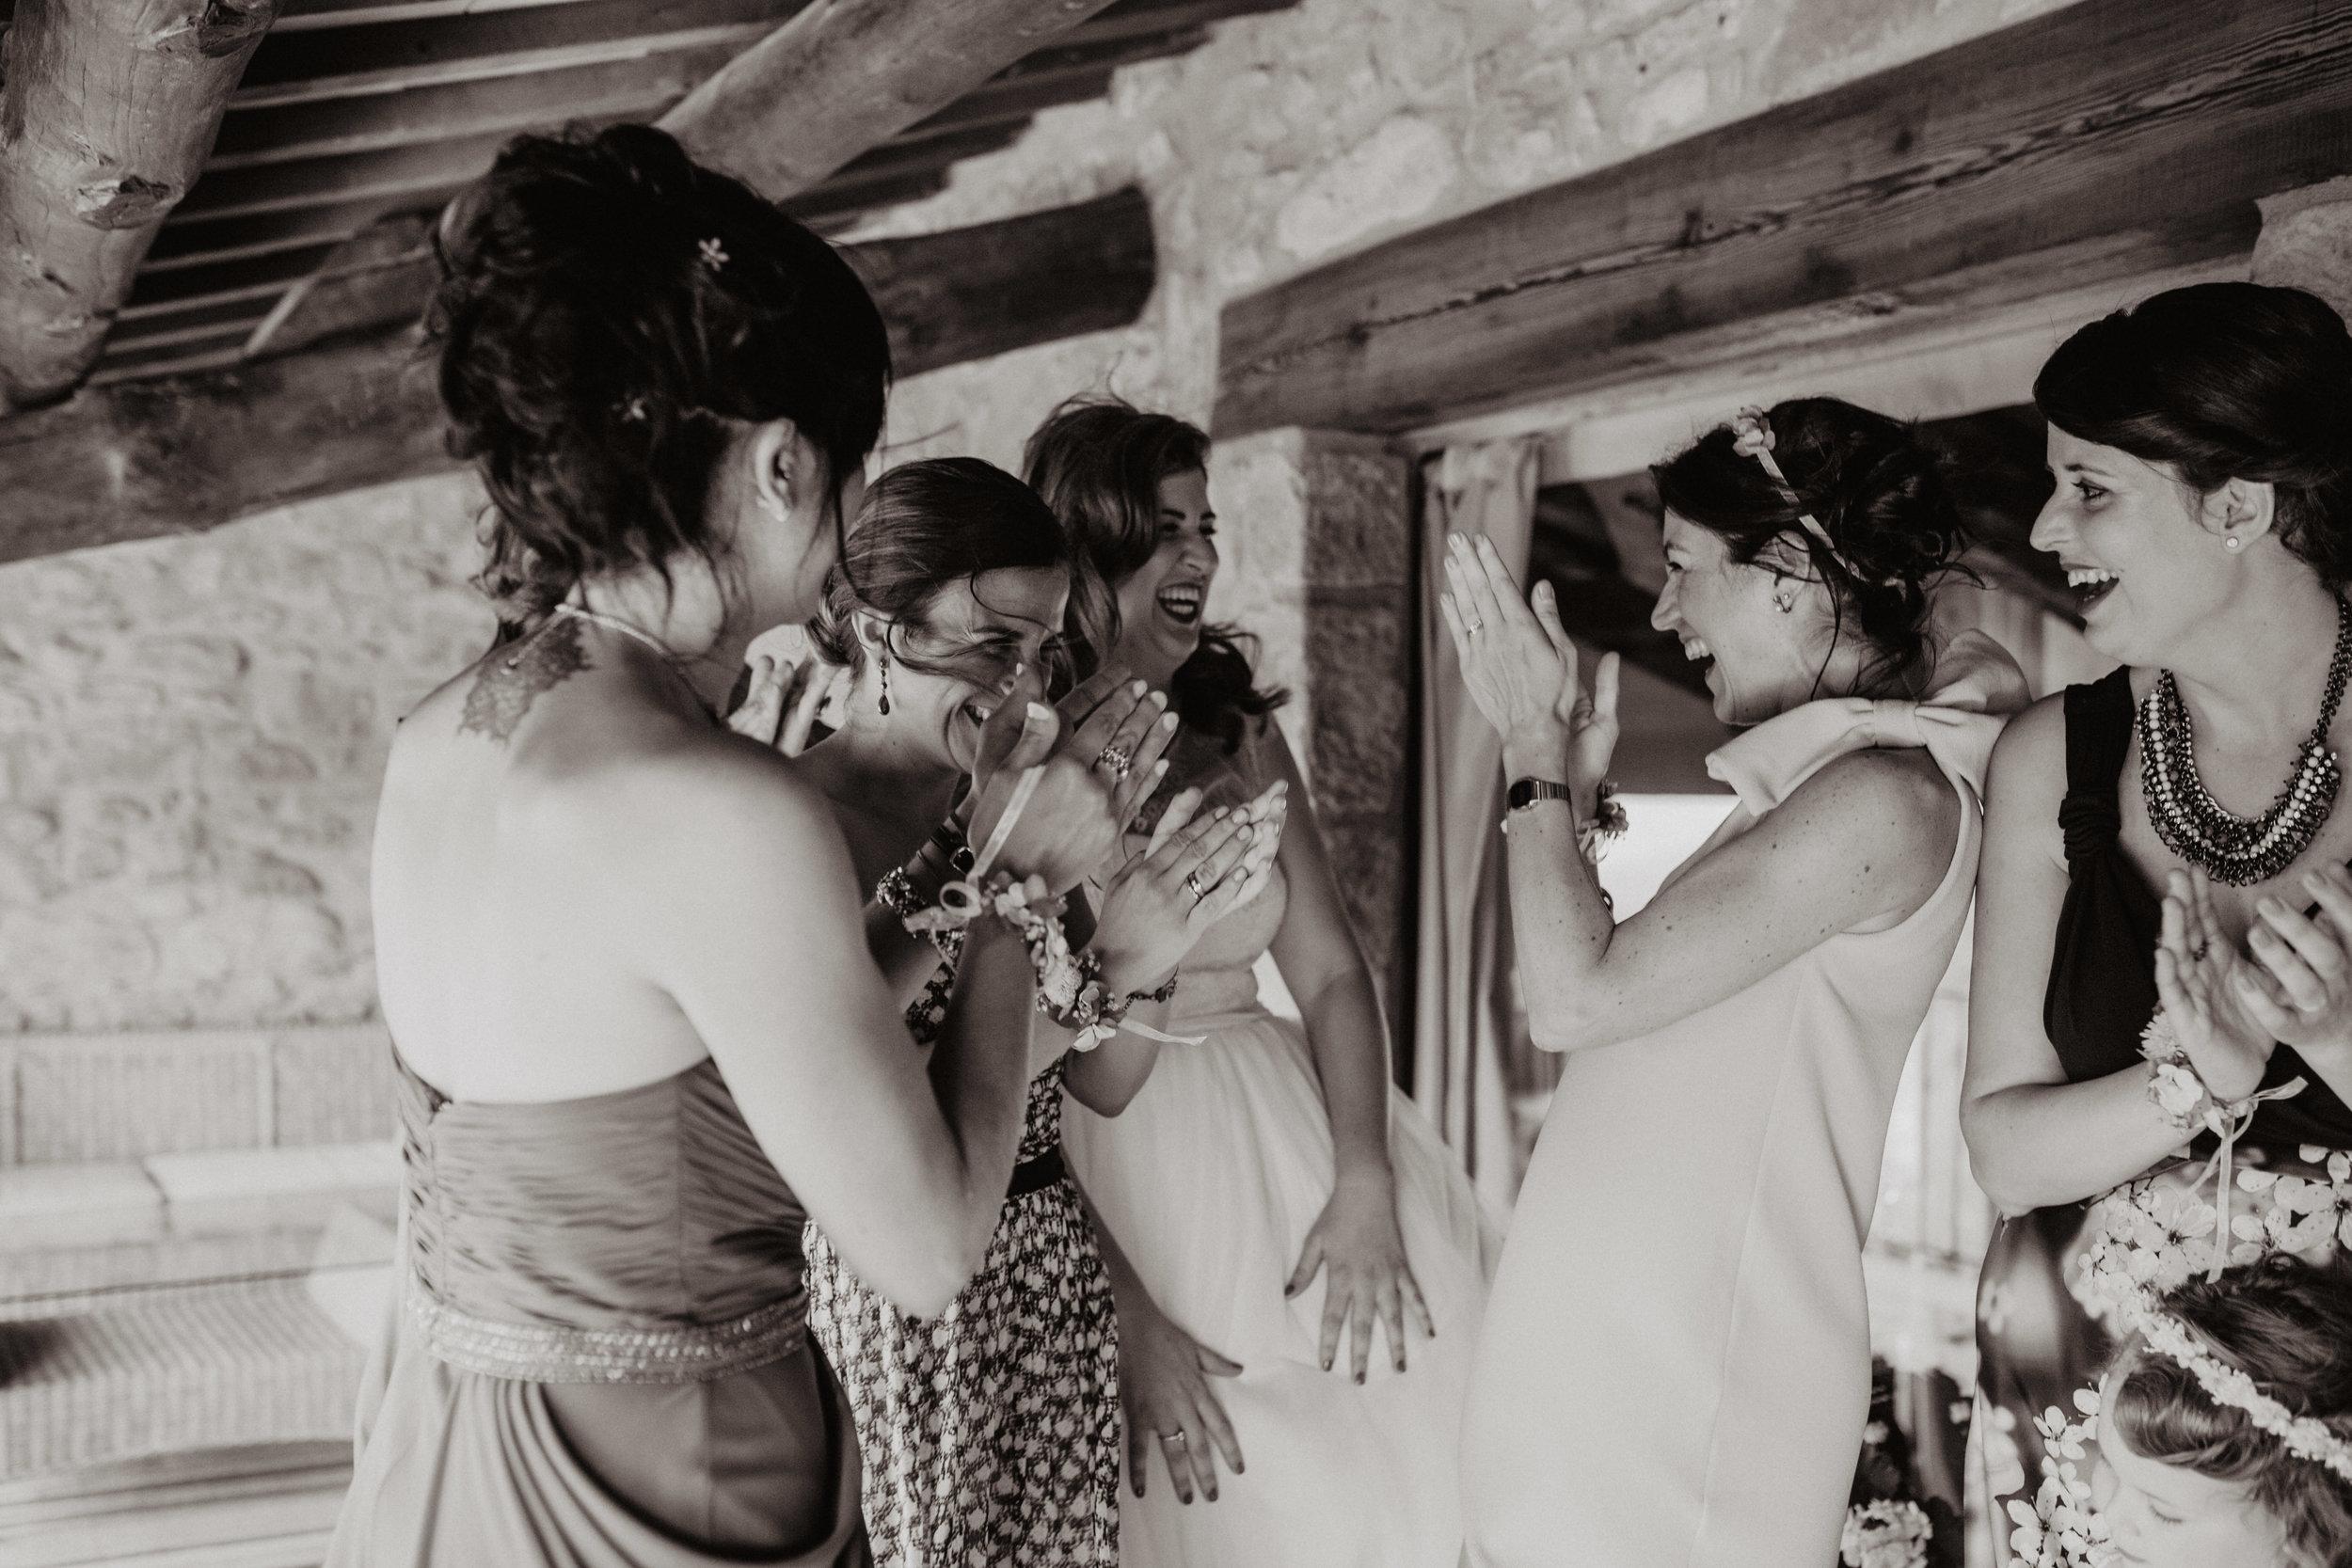 thenortherngirlphotography_photography_thenortherngirl_rebeccascabros_wedding_weddingphotography_masialagarrigadecastelladral_joaniemma_bodaenbarcelona_weddingphotographer_emmaijoan-204.jpg